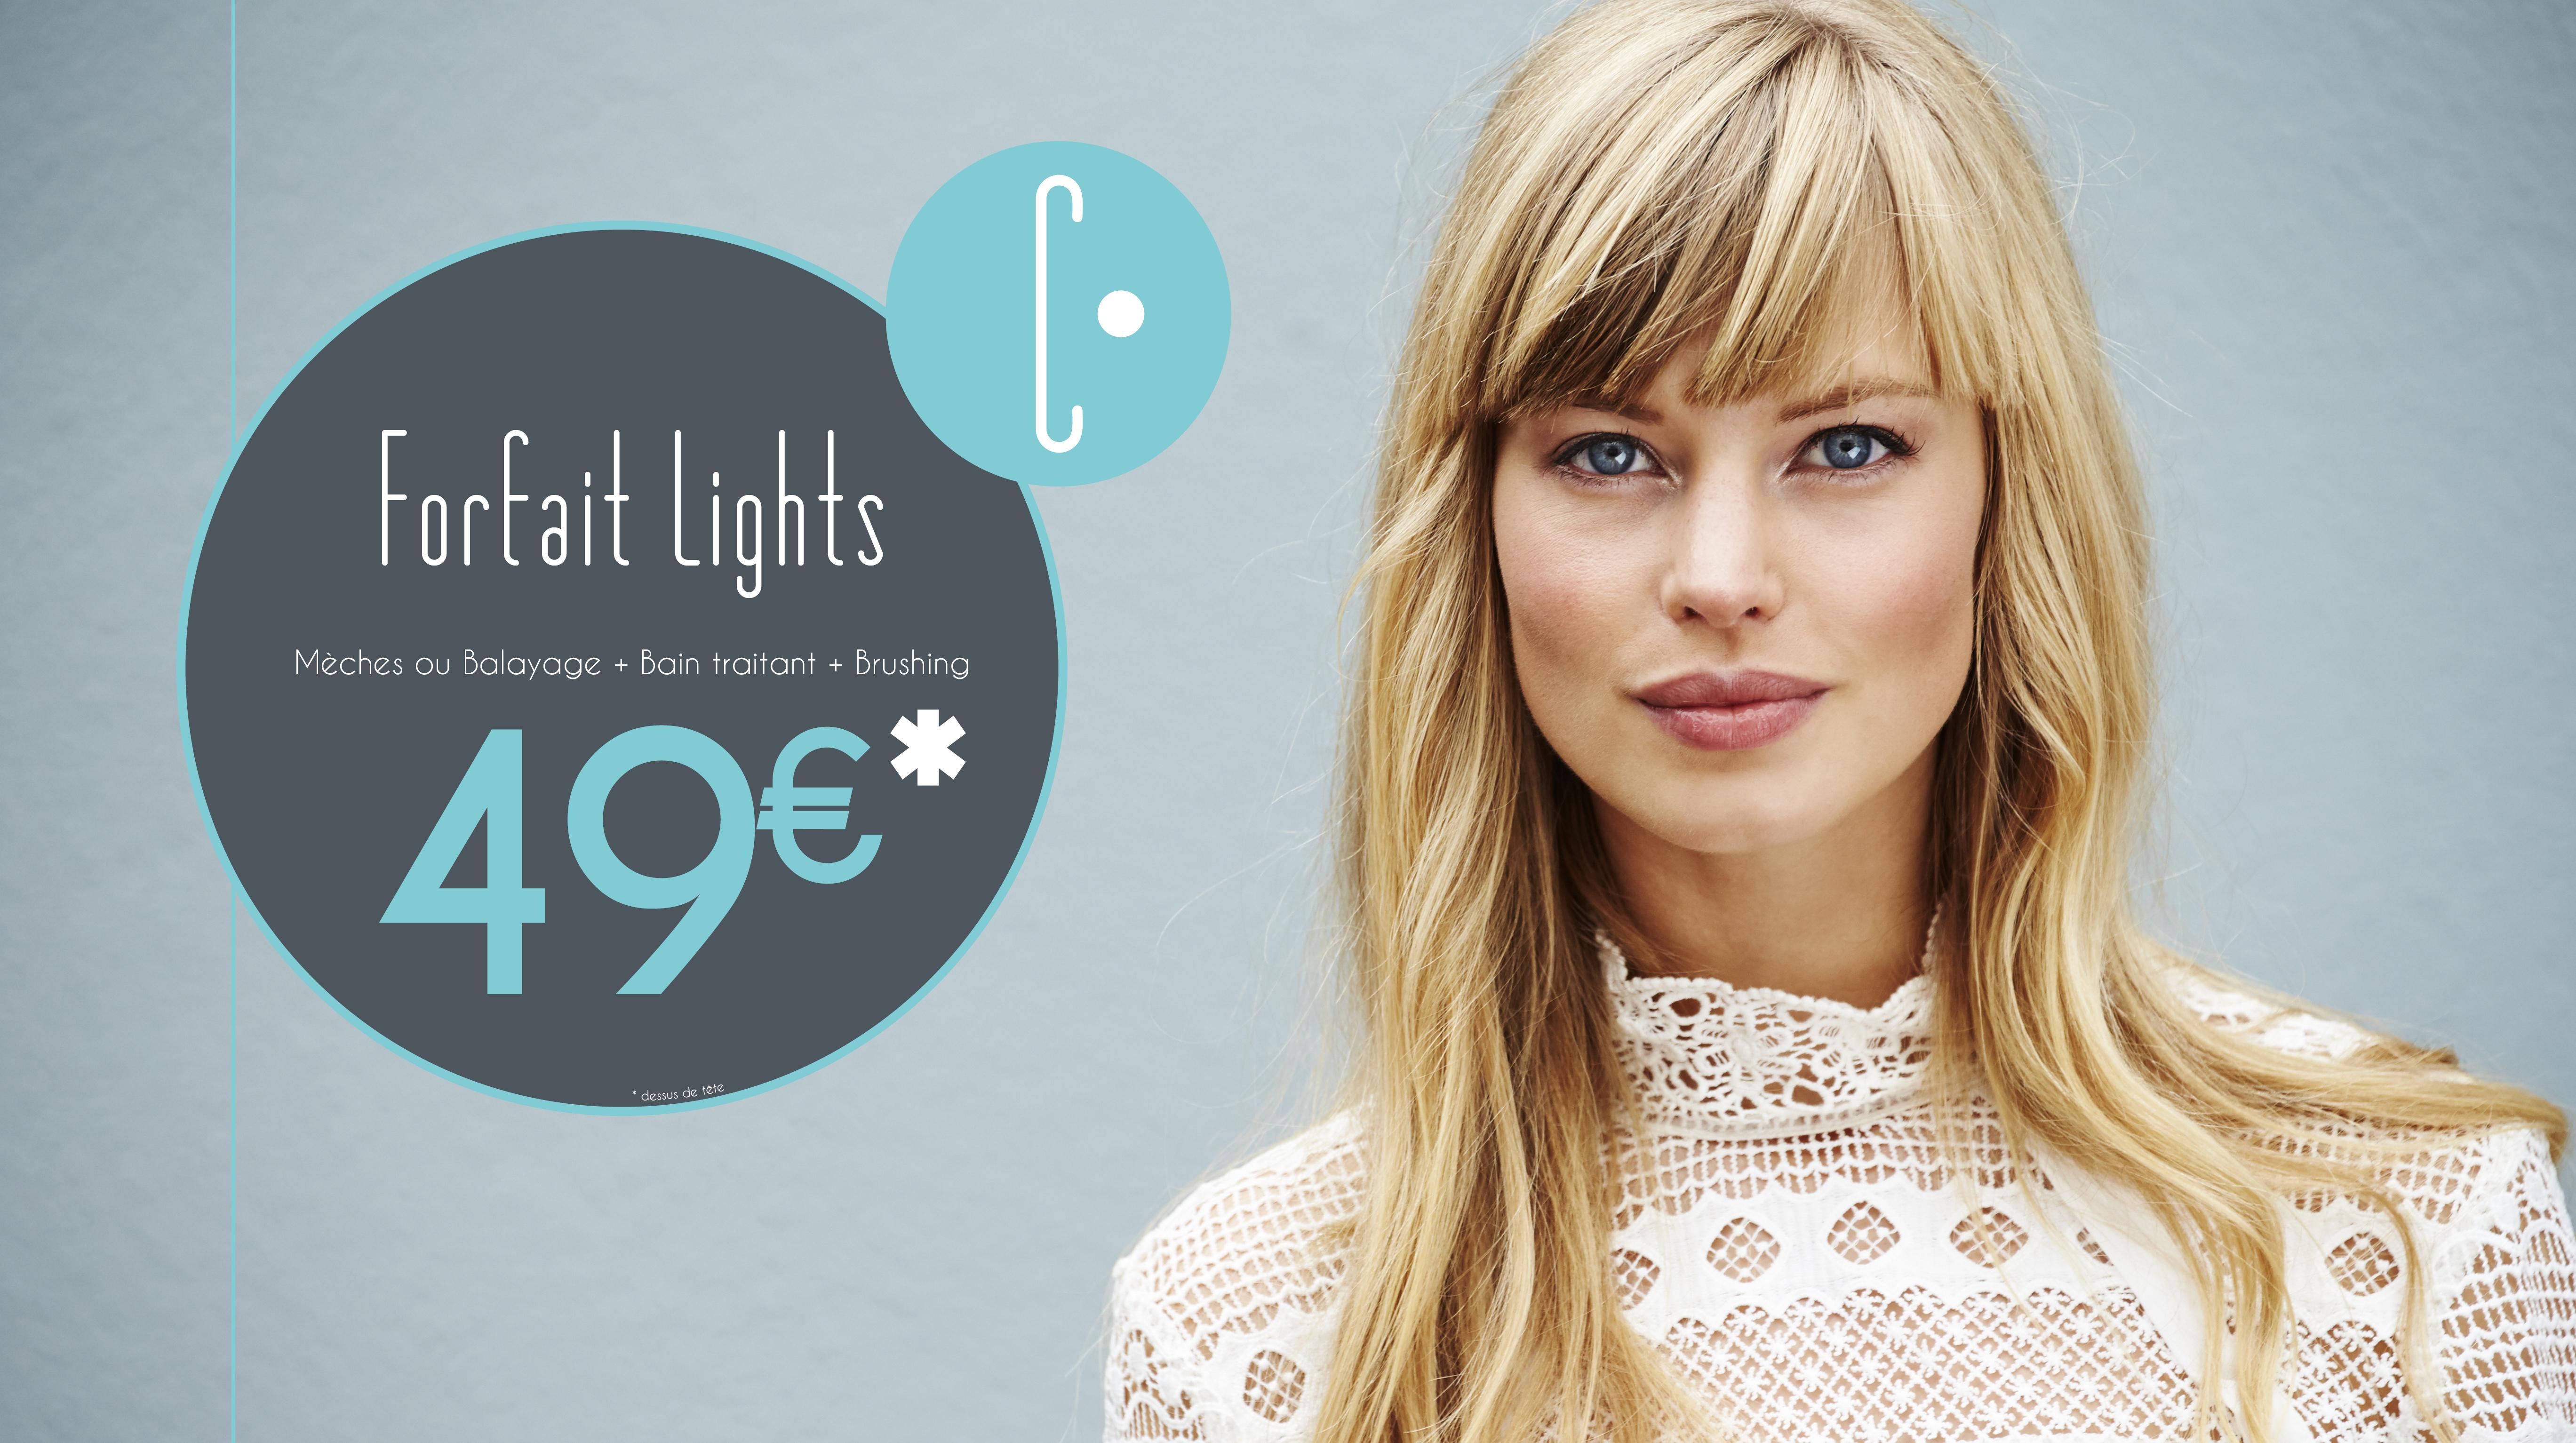 Forfait Lights